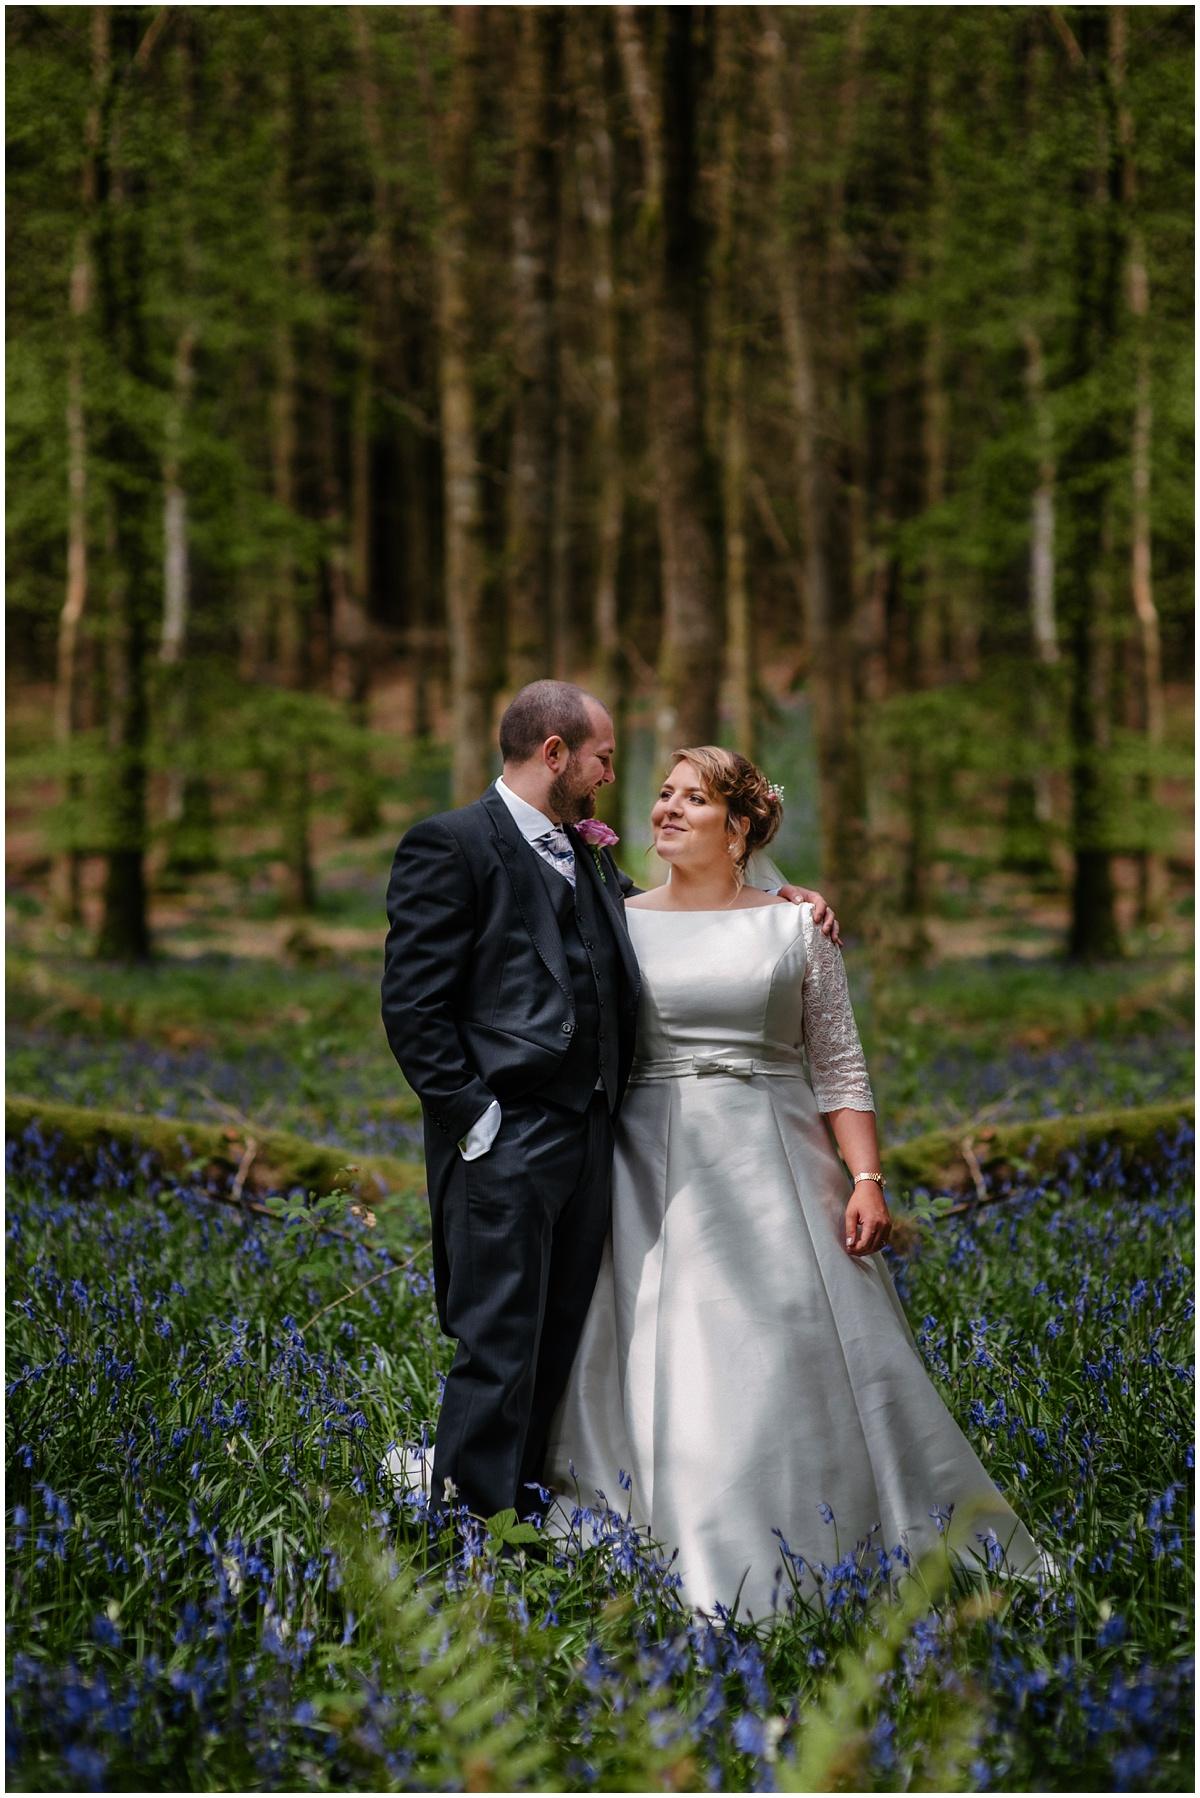 ruth_robbie_lough_erne_resort_wedding_jude_browne_photography_0064.jpg